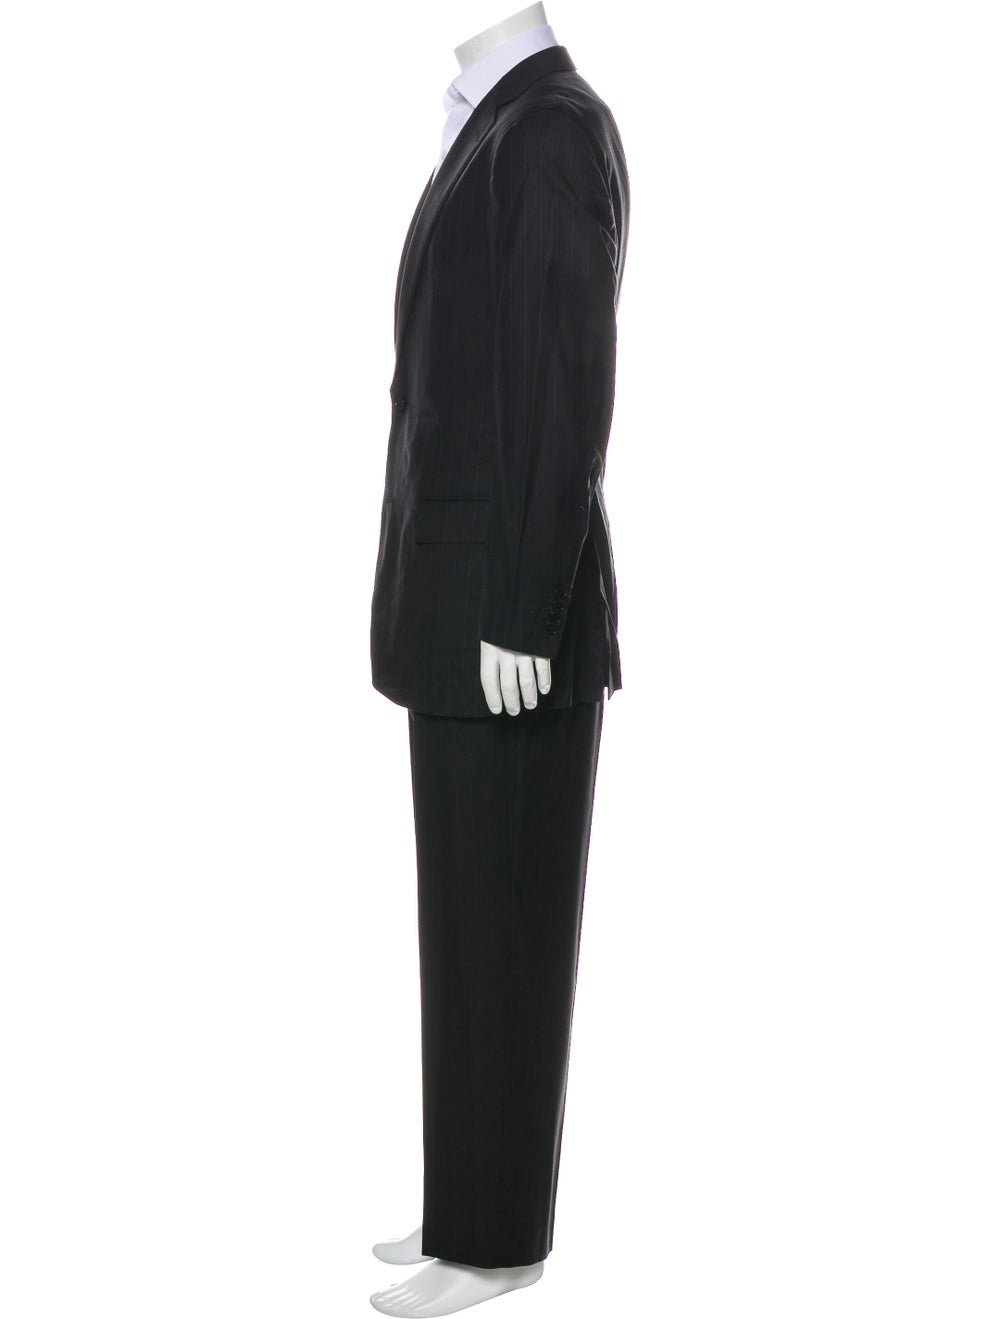 Ermenegildo Zegna Silk Striped Two-Piece Suit Bla… - image 2